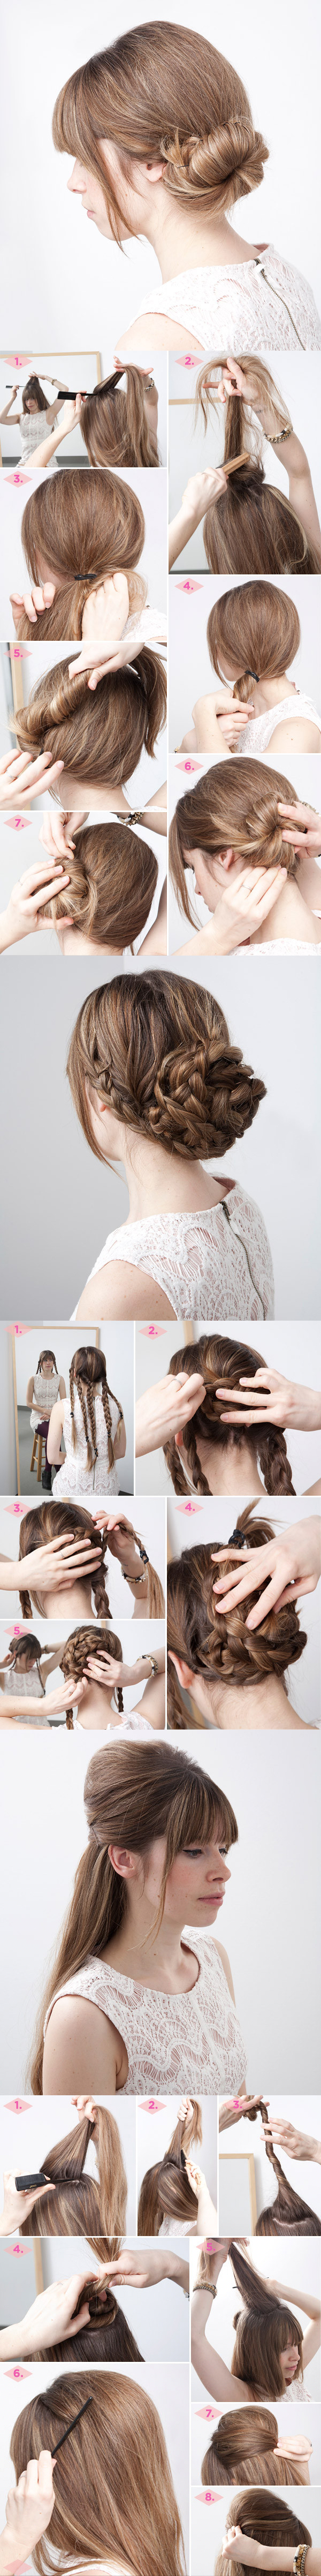 Pleasant 13 Rather Simple Bun Hairstyles Tutorials For 2014 Pretty Designs Short Hairstyles For Black Women Fulllsitofus